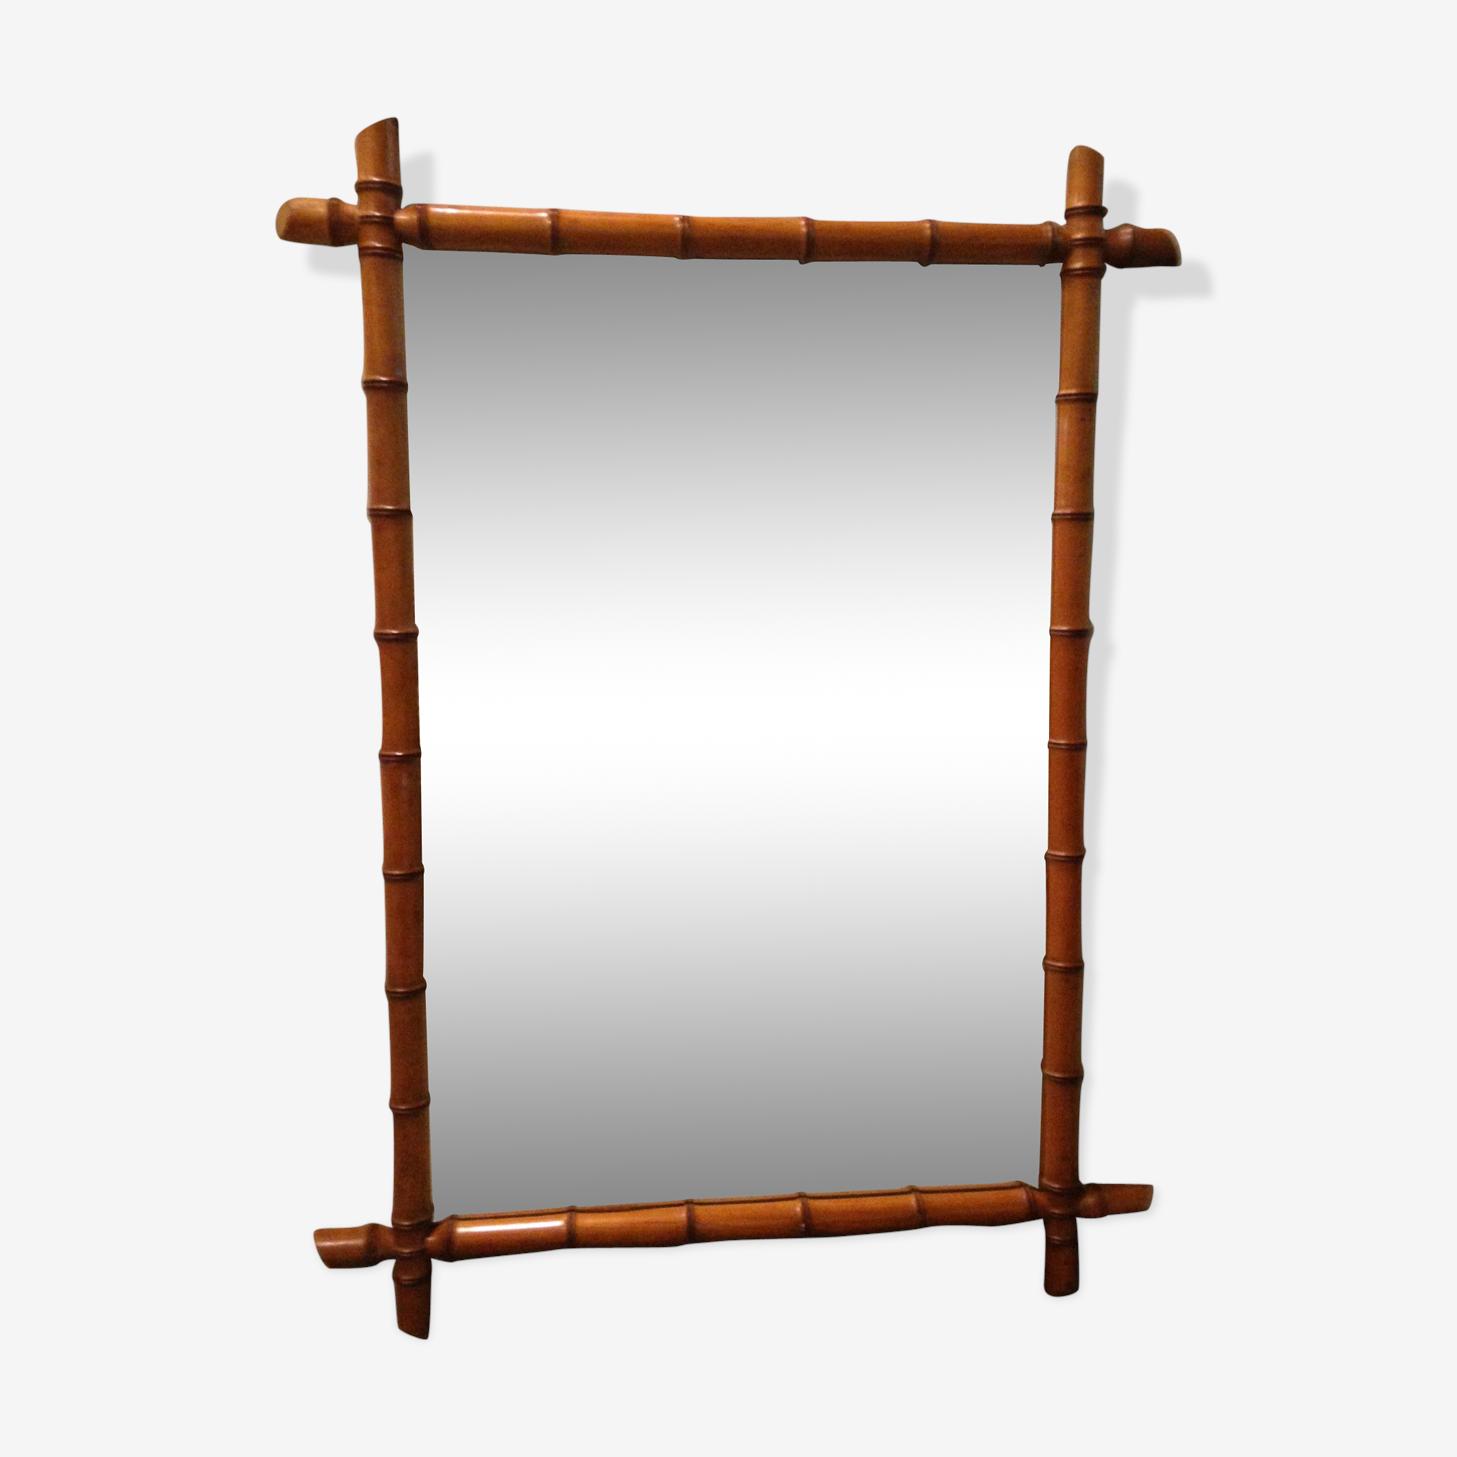 Miroir bambou ancien 100x80cm